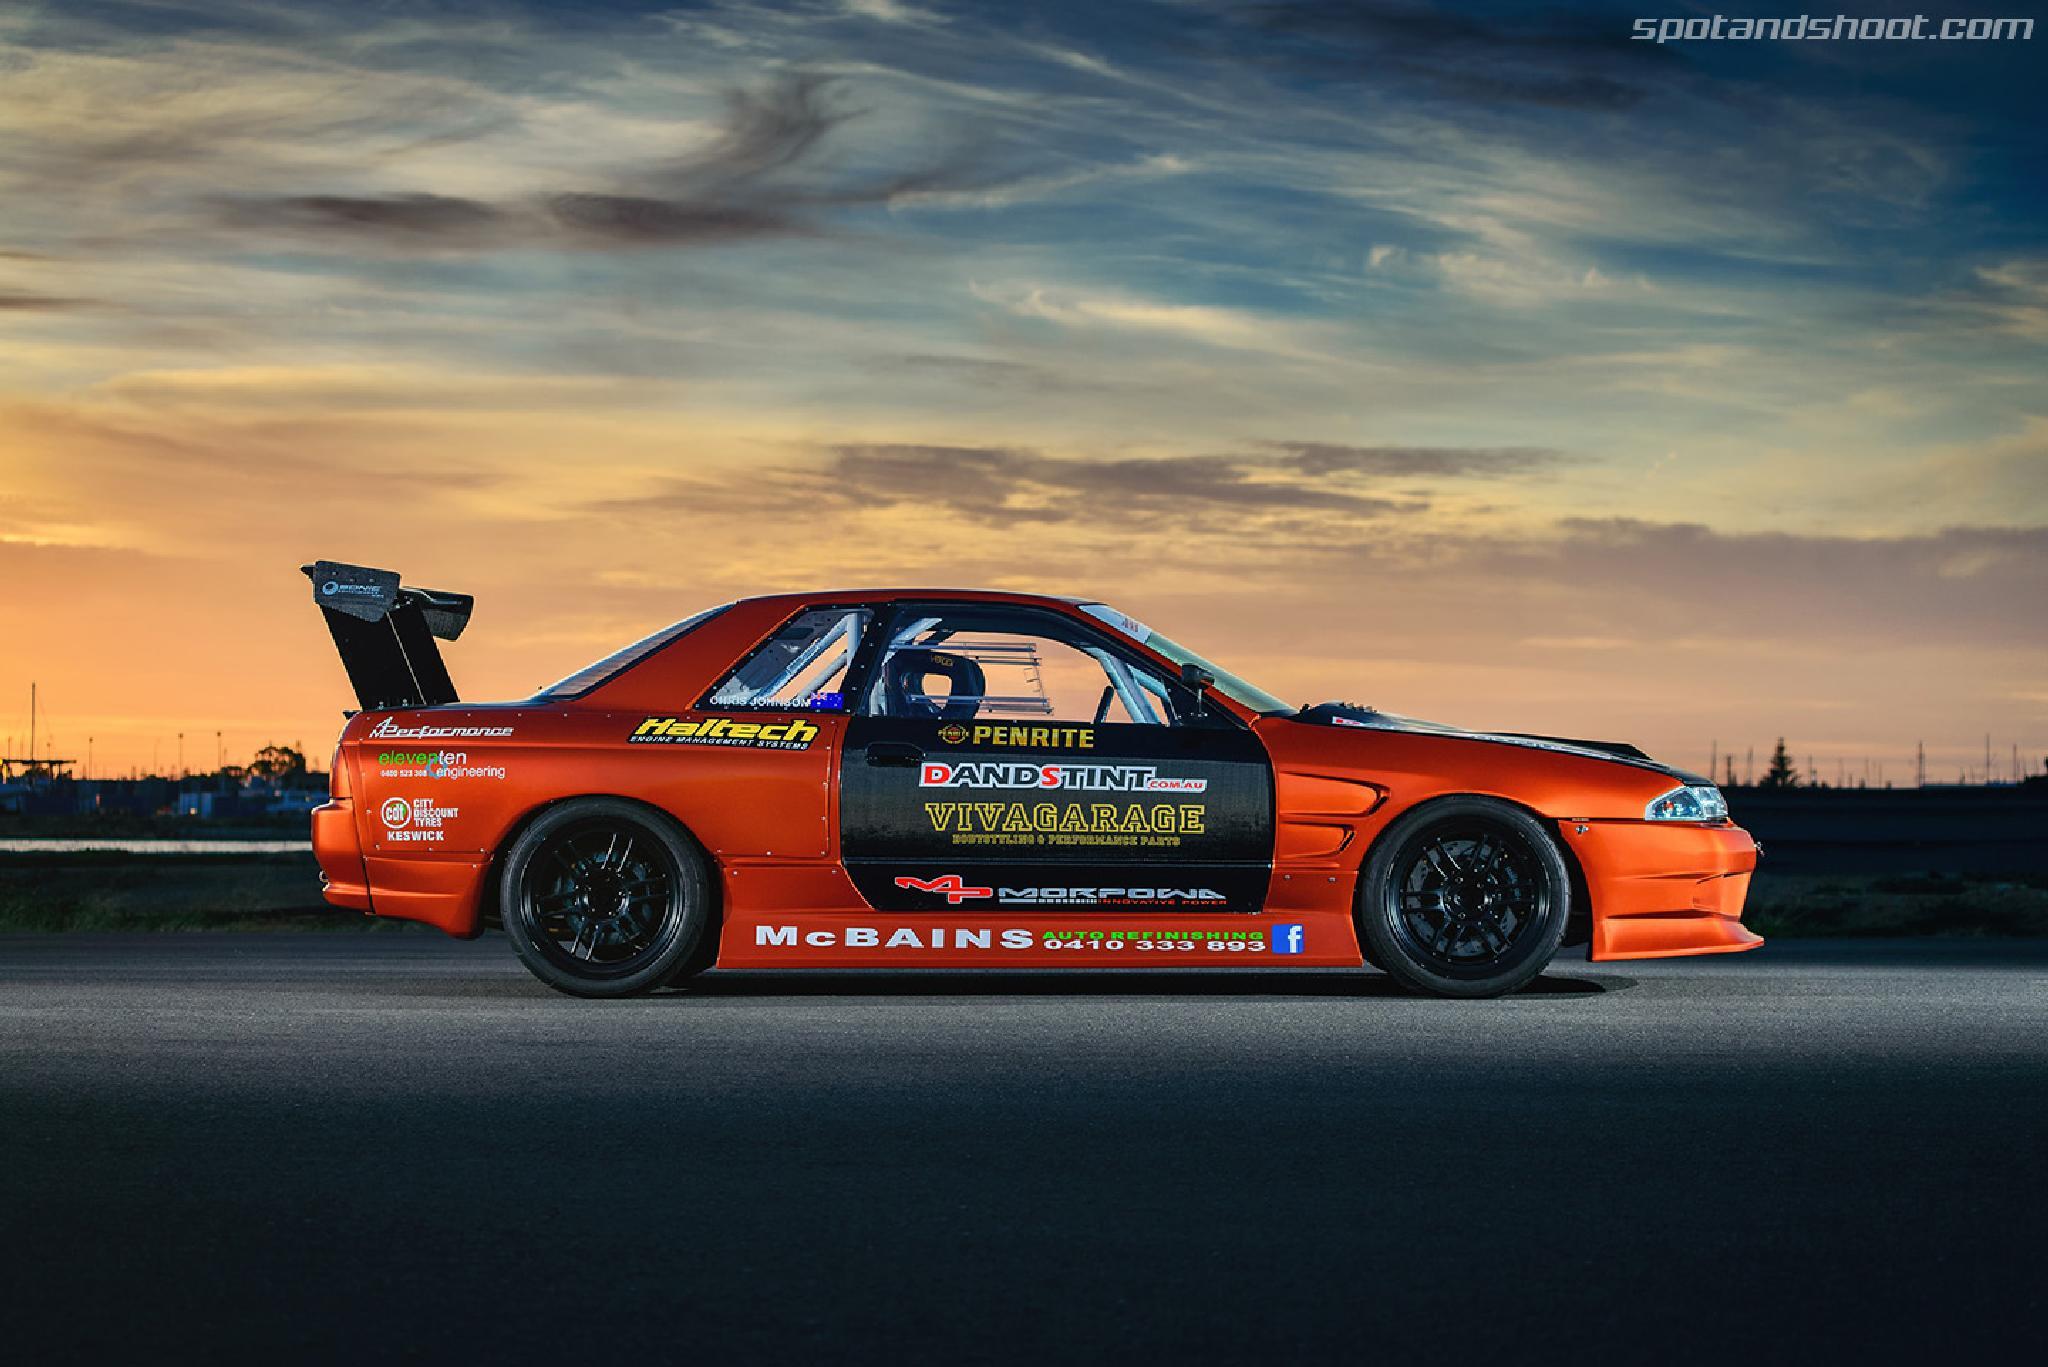 Nissan SKYLINE R32 GTS-T by Andrey Moisseyev Photographer